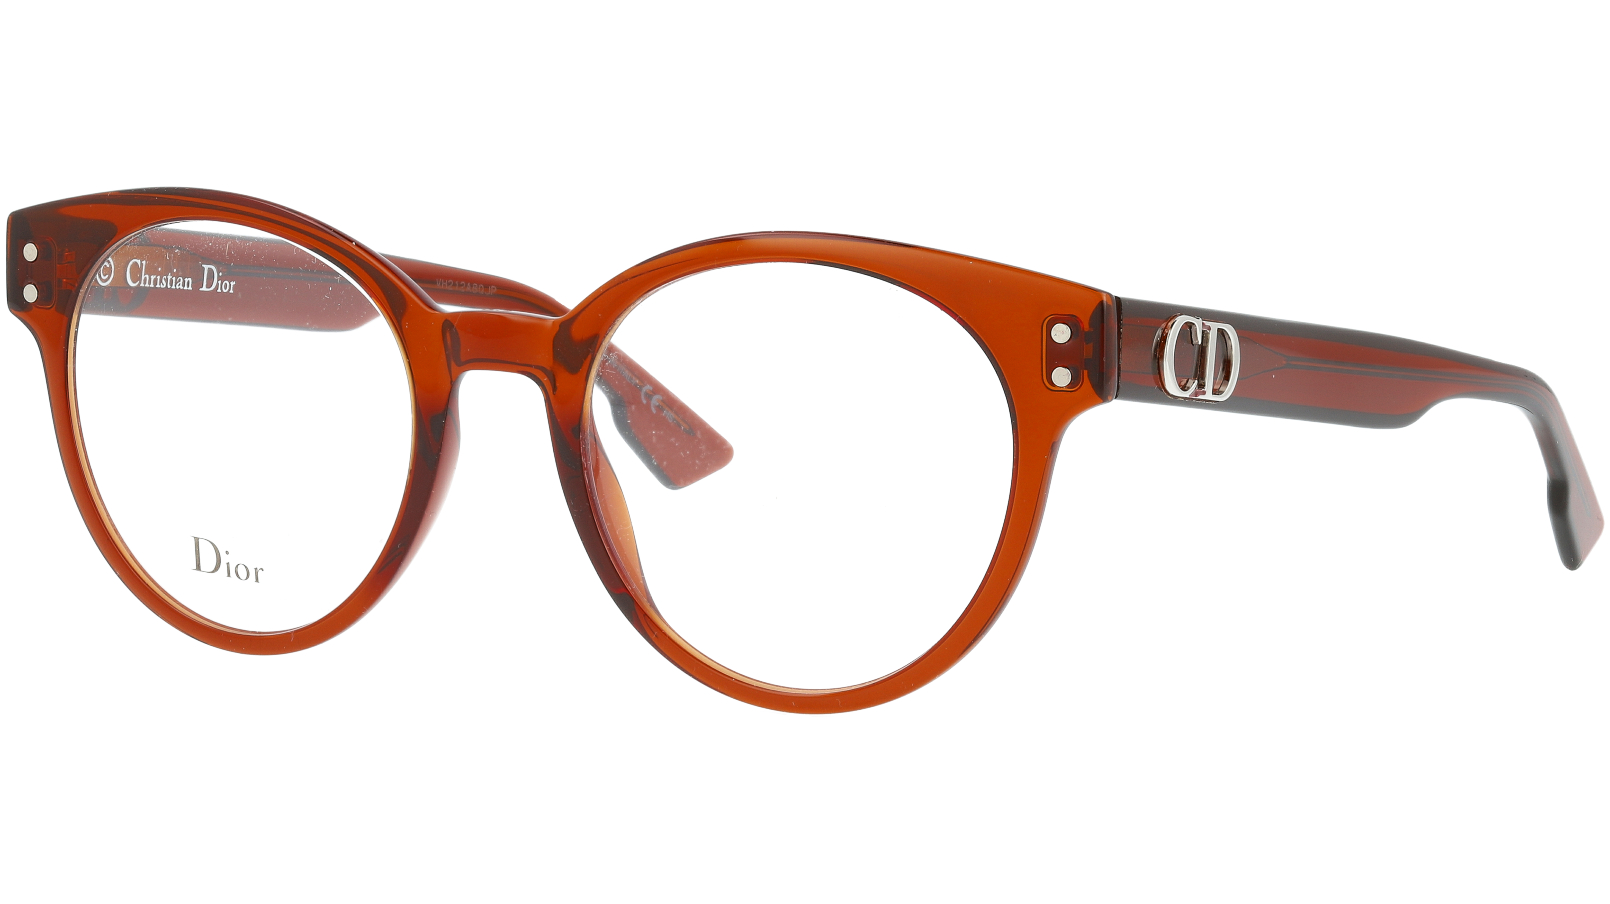 DIOR DIORCD3 2LF 49 BRICK Glasses